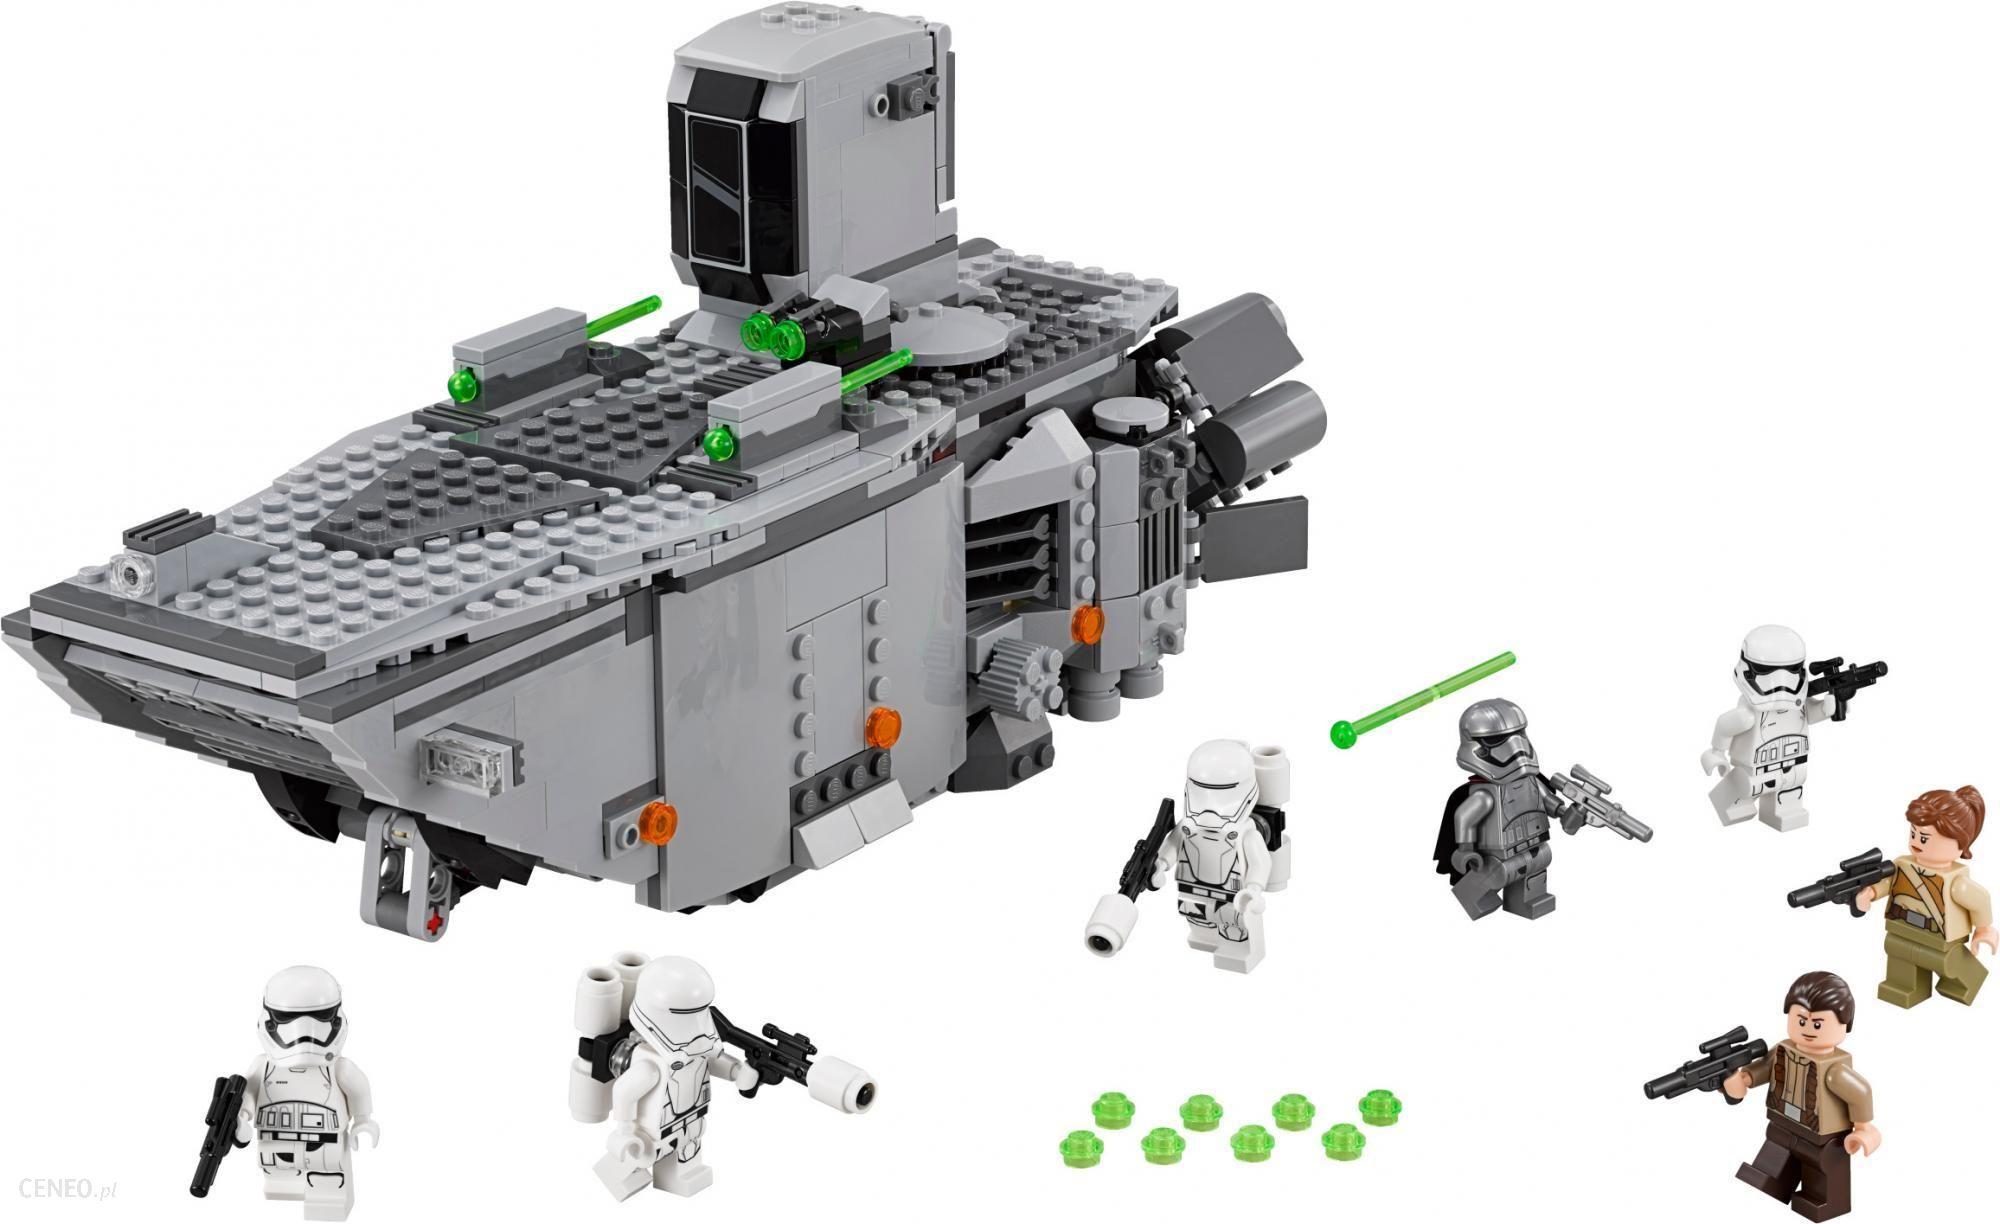 Klocki Lego Star Wars First Order Transporter 75103 Ceny I Opinie